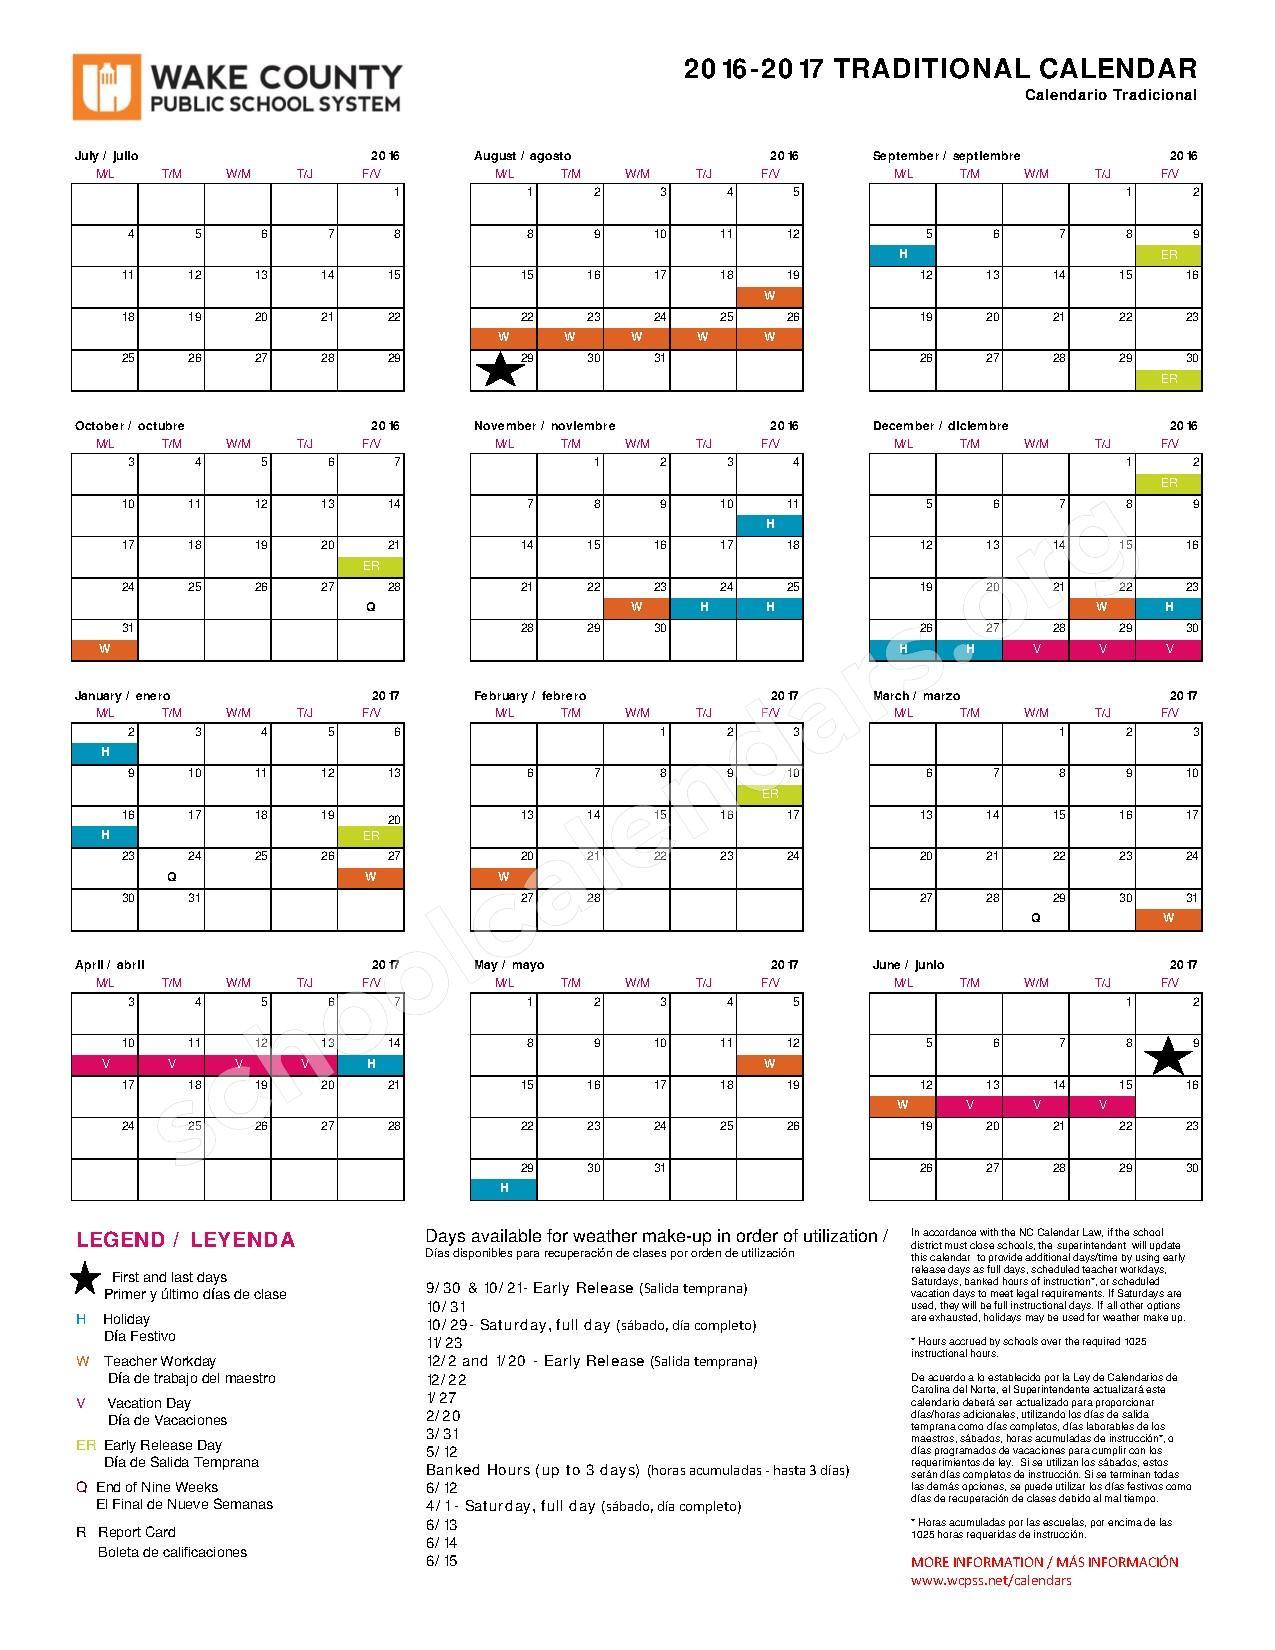 Wake County School System Calendars   Printable Calendar With Gcu Academic Calendar Non Traditional 2020